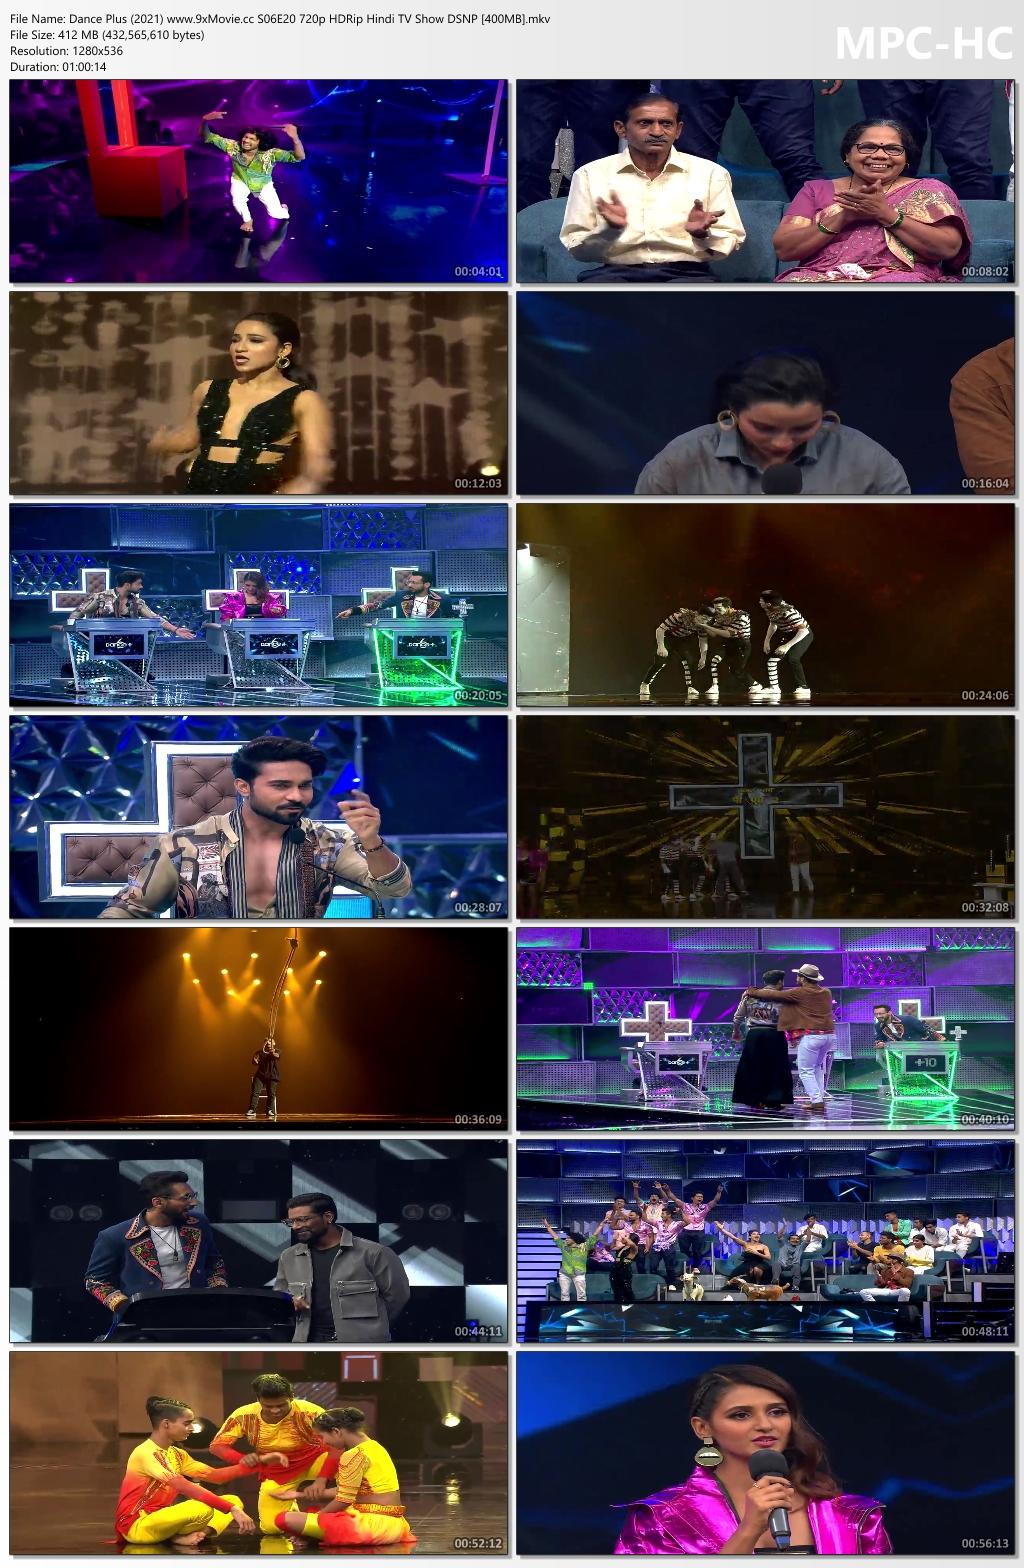 Dance-Plus-2021-www-9x-Movie-cc-S06-E20-720p-HDRip-Hindi-TV-Show-DSNP-400-MB-mkv